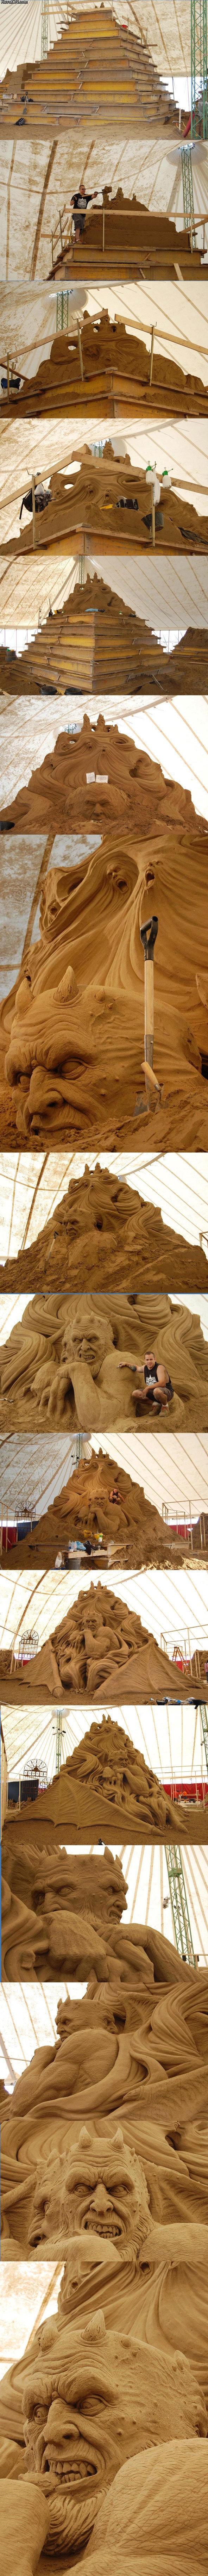 Awesome sand castle. .. i came